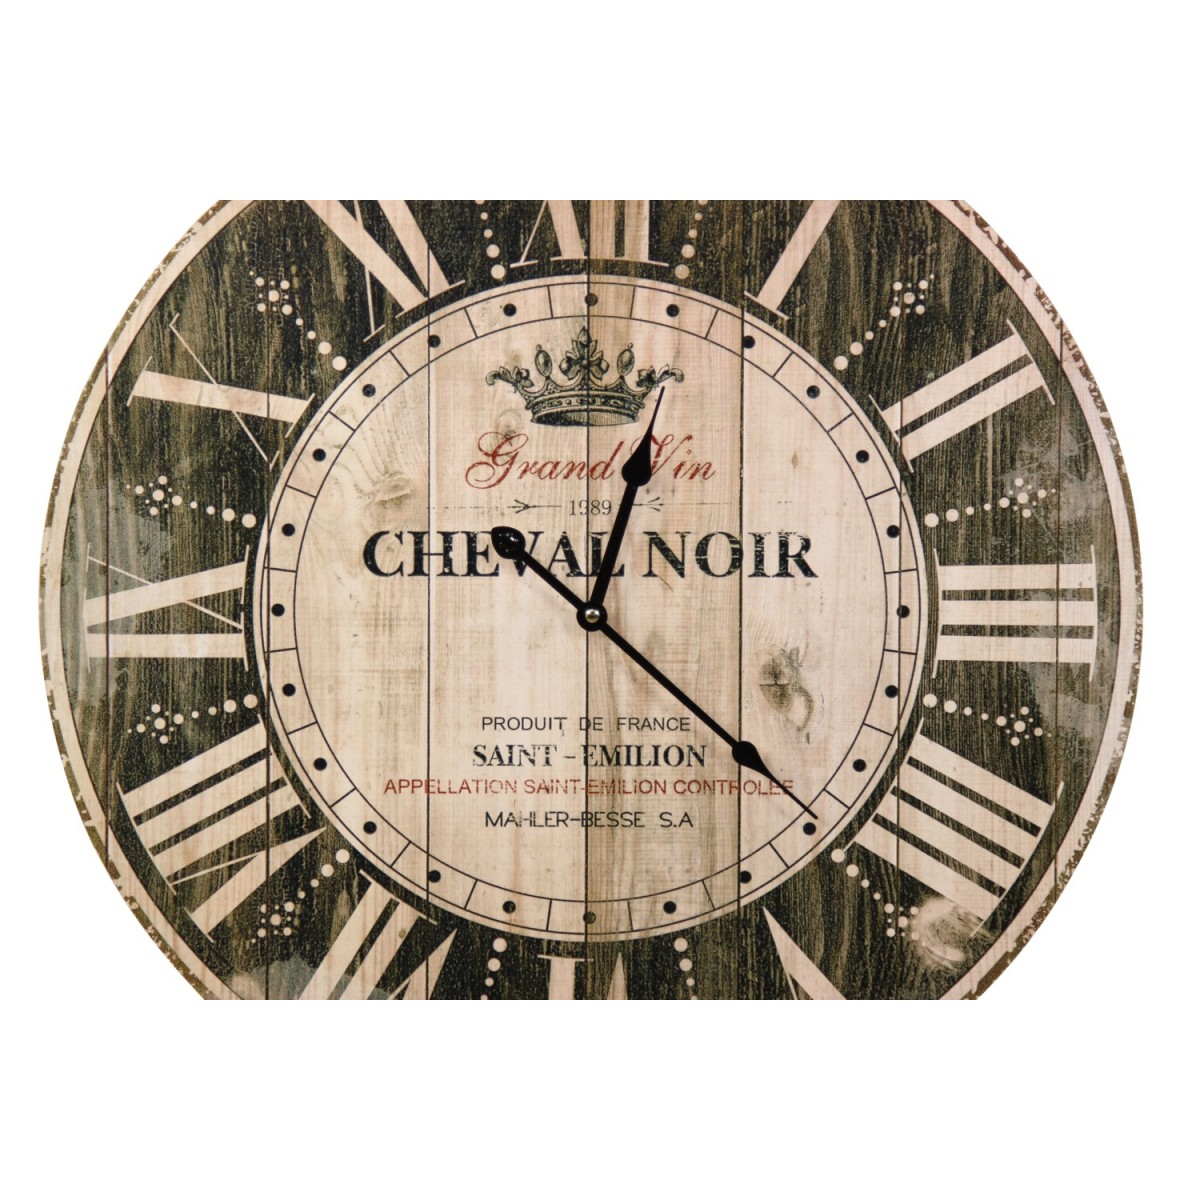 Horloge Ancienne Murale Grand Vin Cheval Noir Marron 58cm